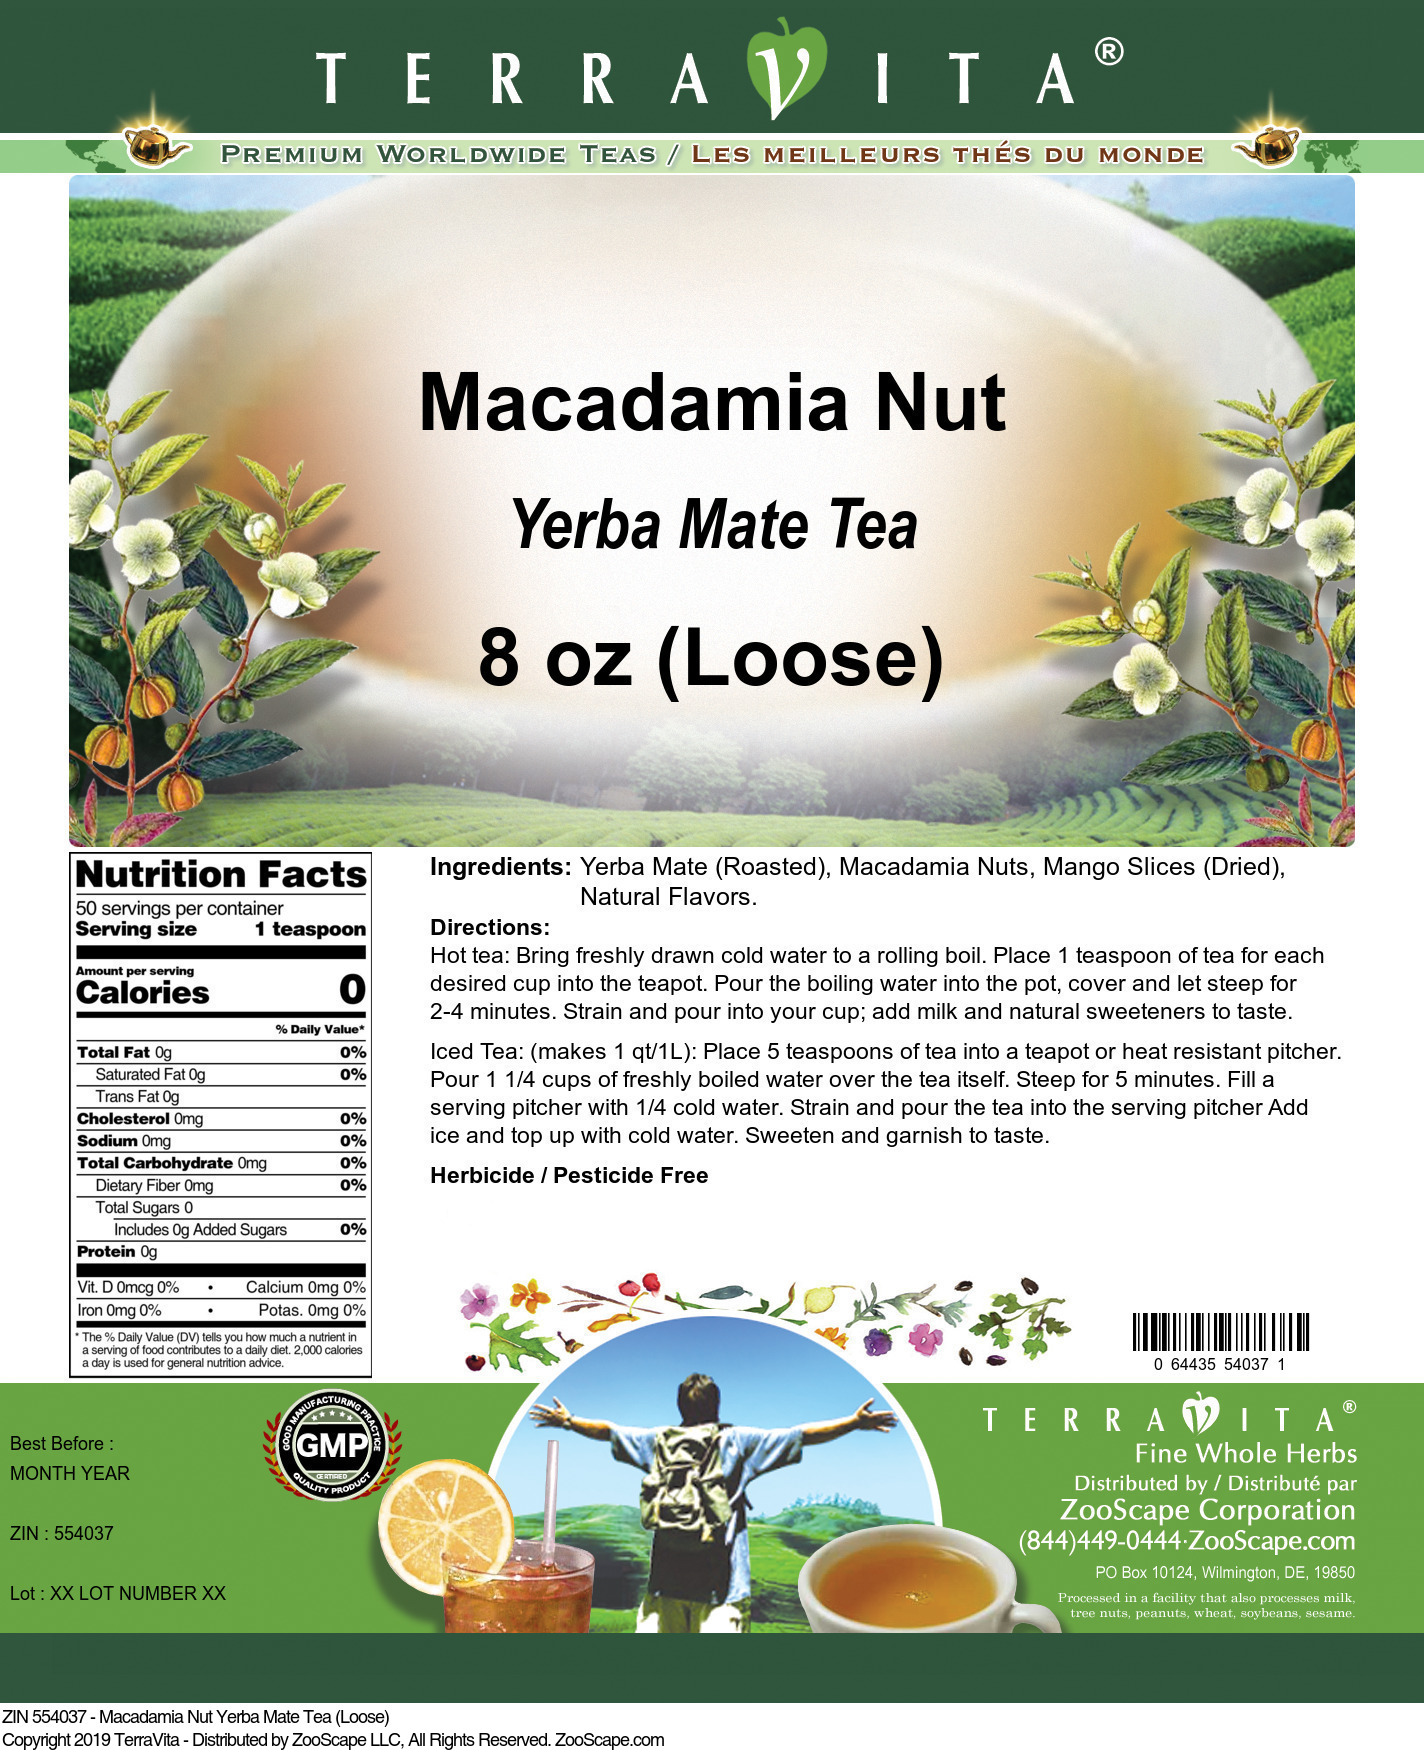 Macadamia Nut Yerba Mate